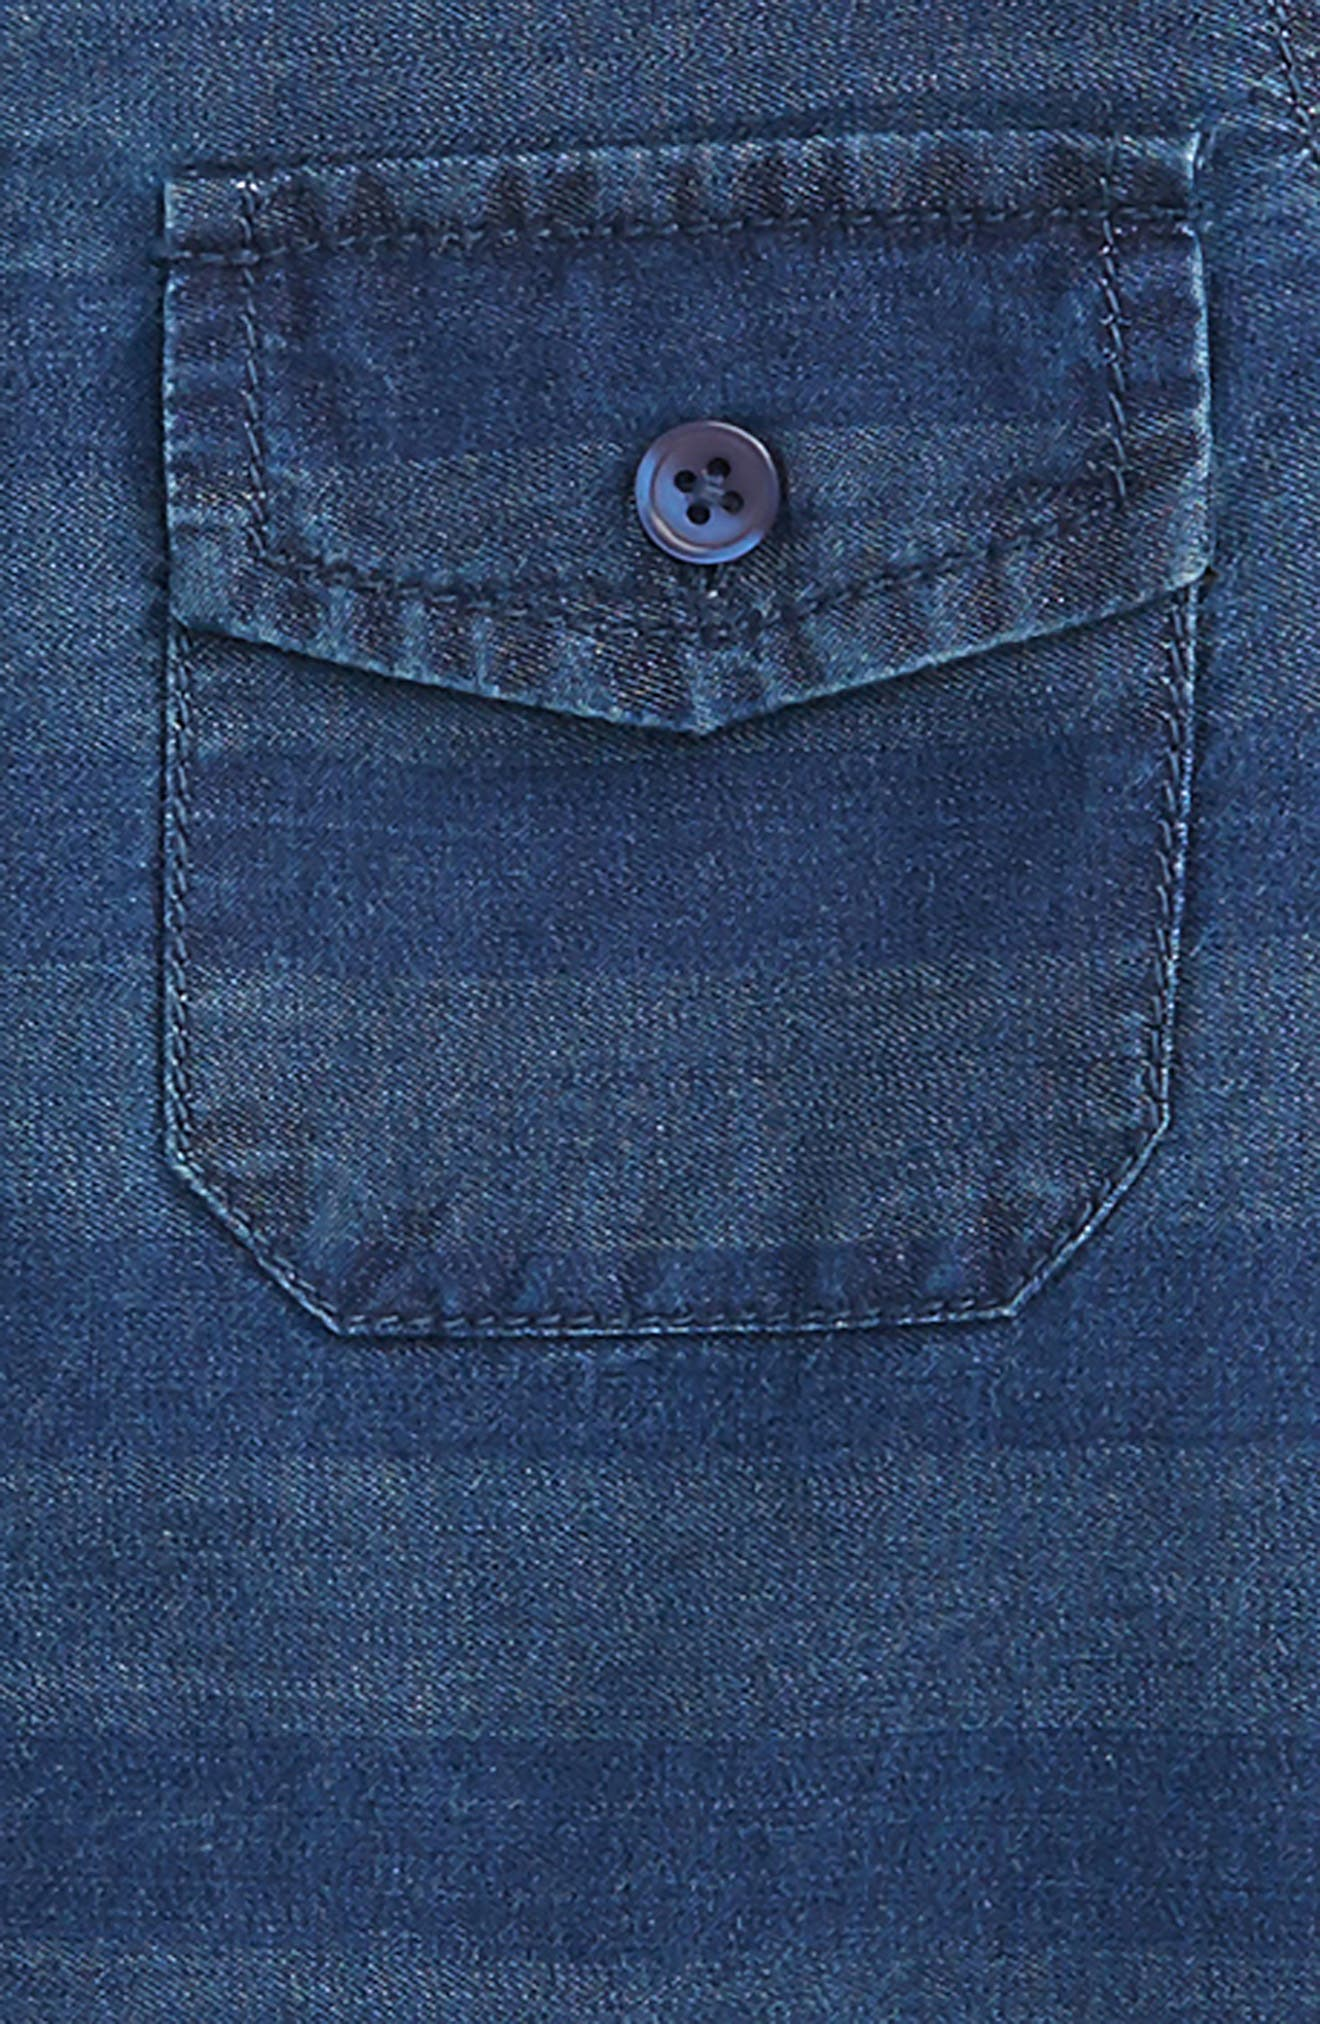 Aiden Stripe Chambray Shirt,                             Alternate thumbnail 3, color,